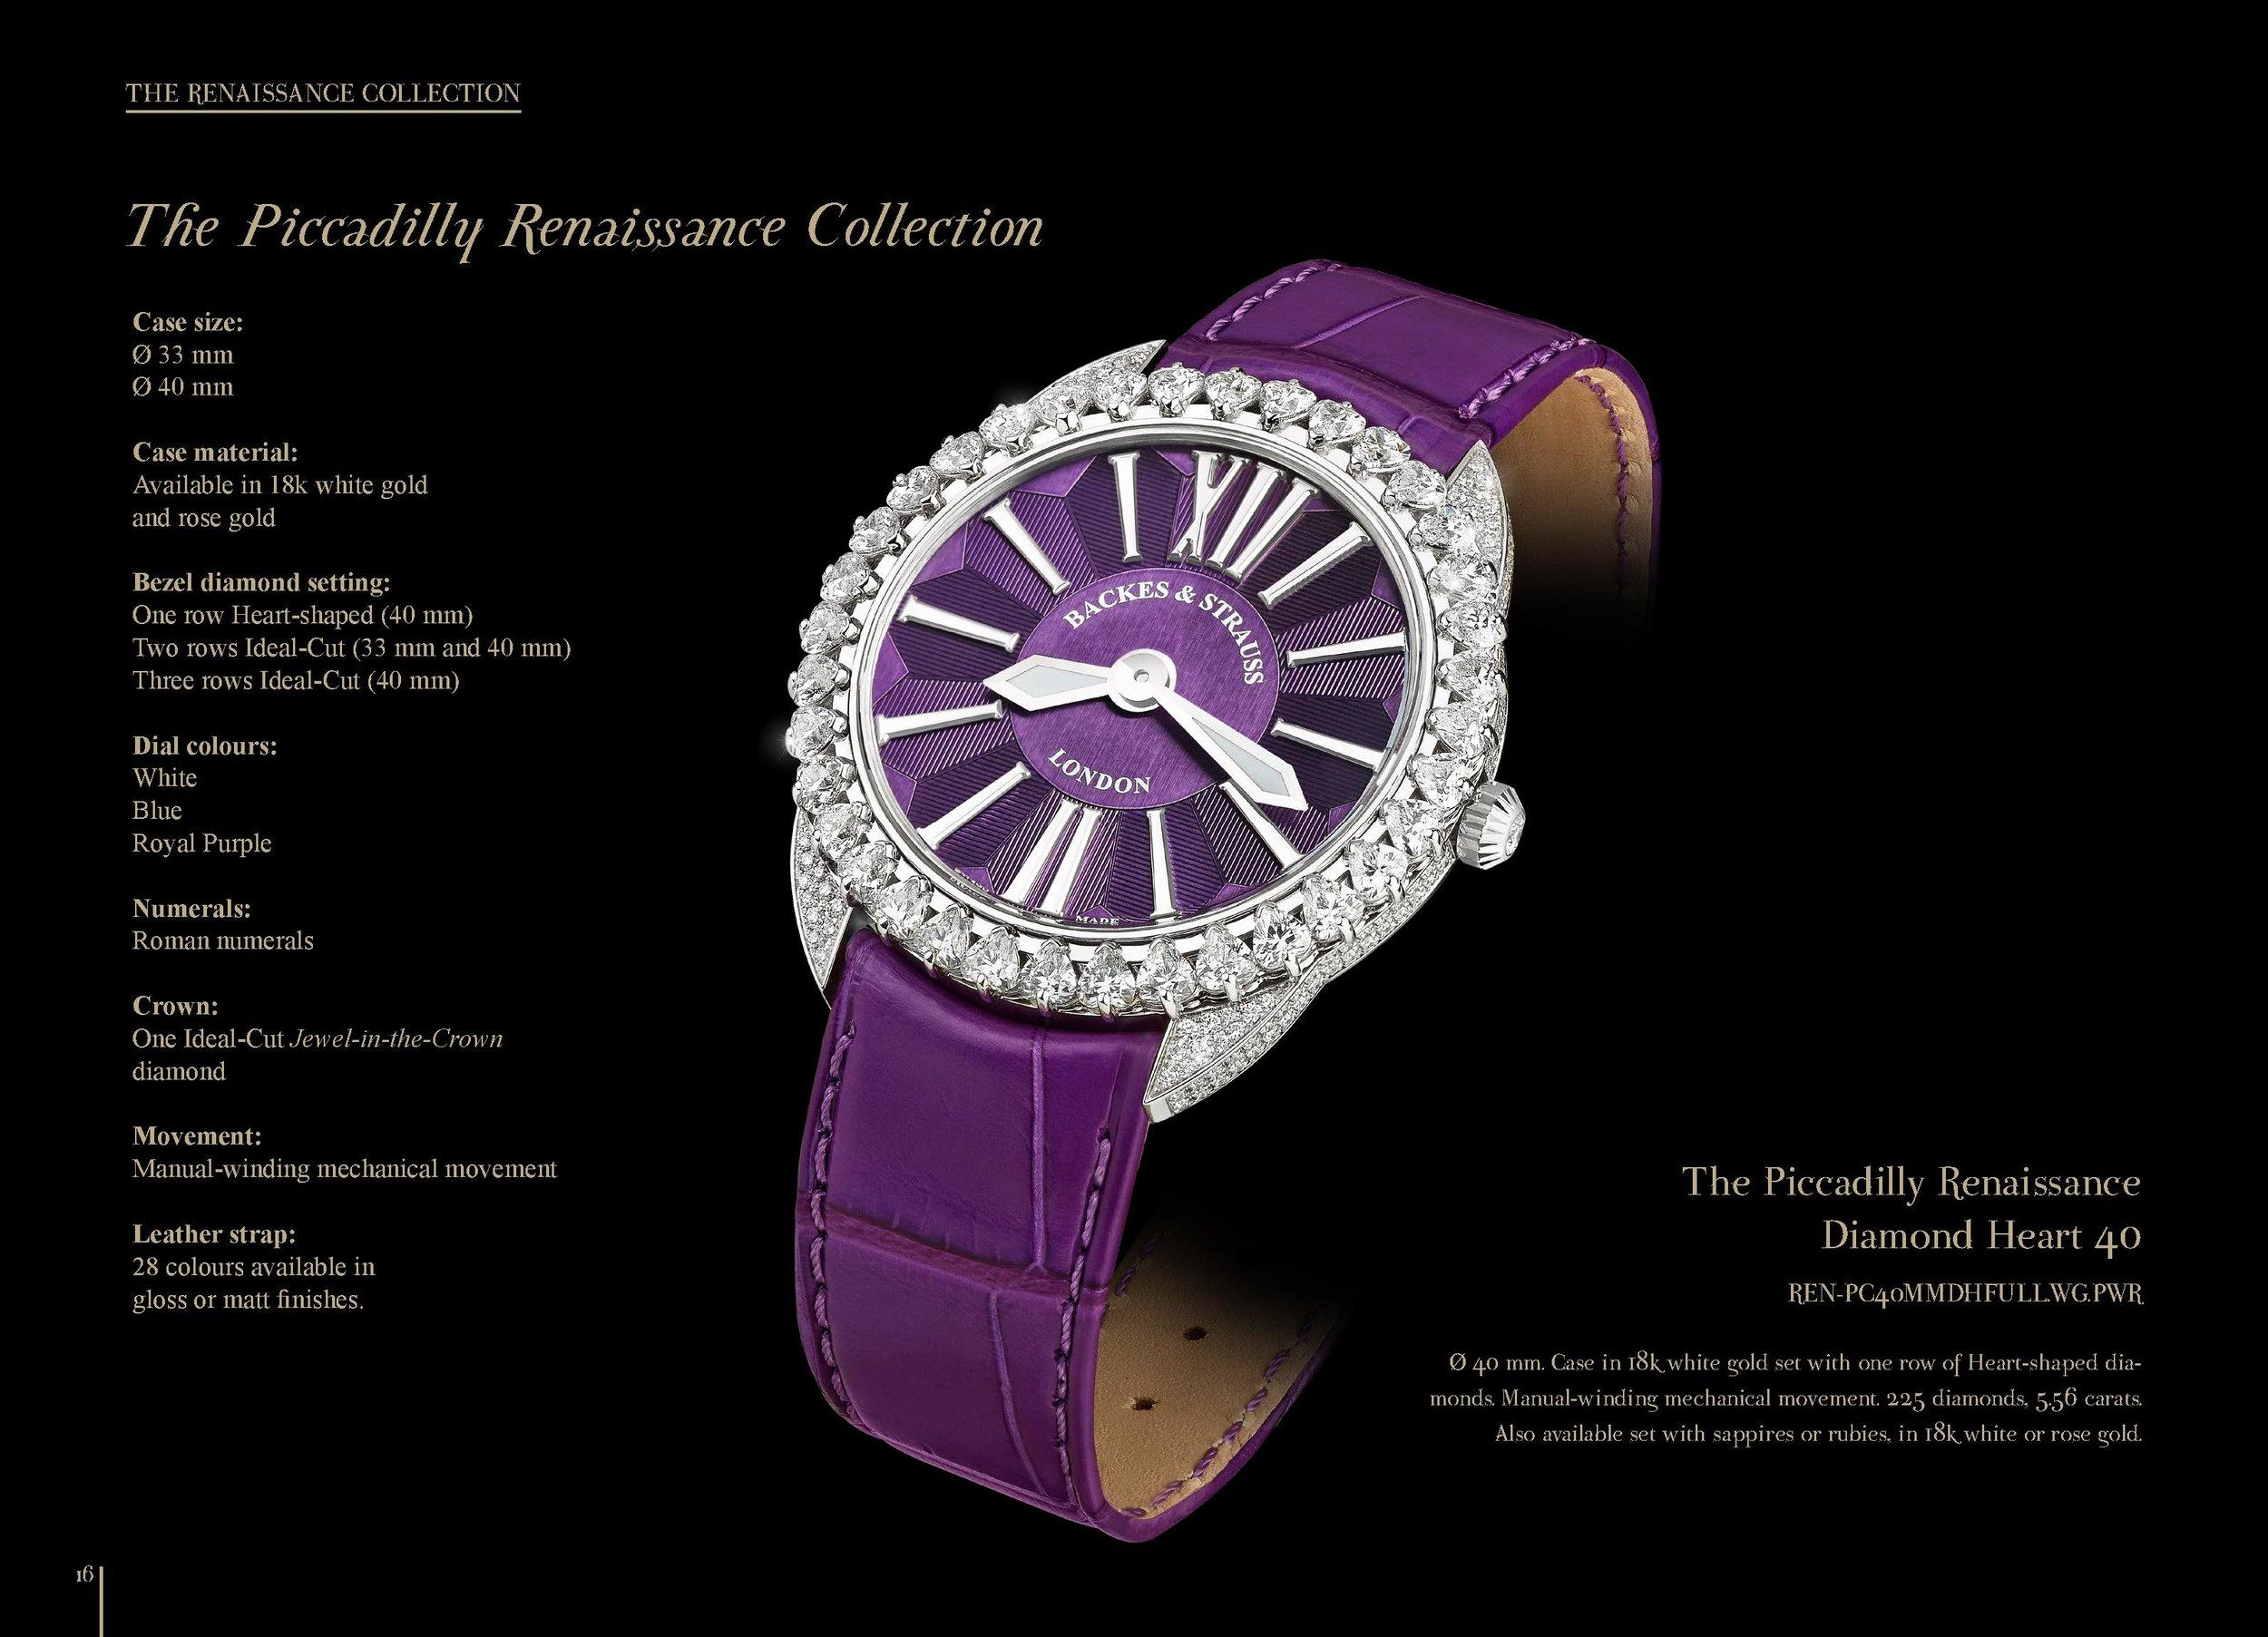 Piccadilly Renaissance Diamond Heart 40 watch